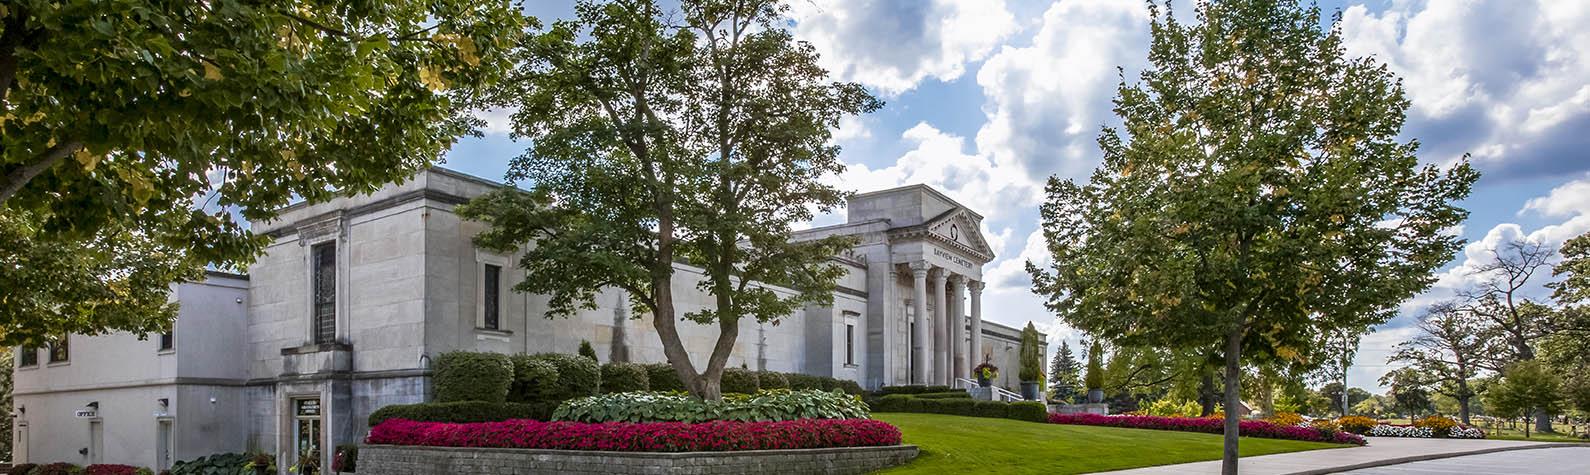 Bayview mausoleum in Burlington